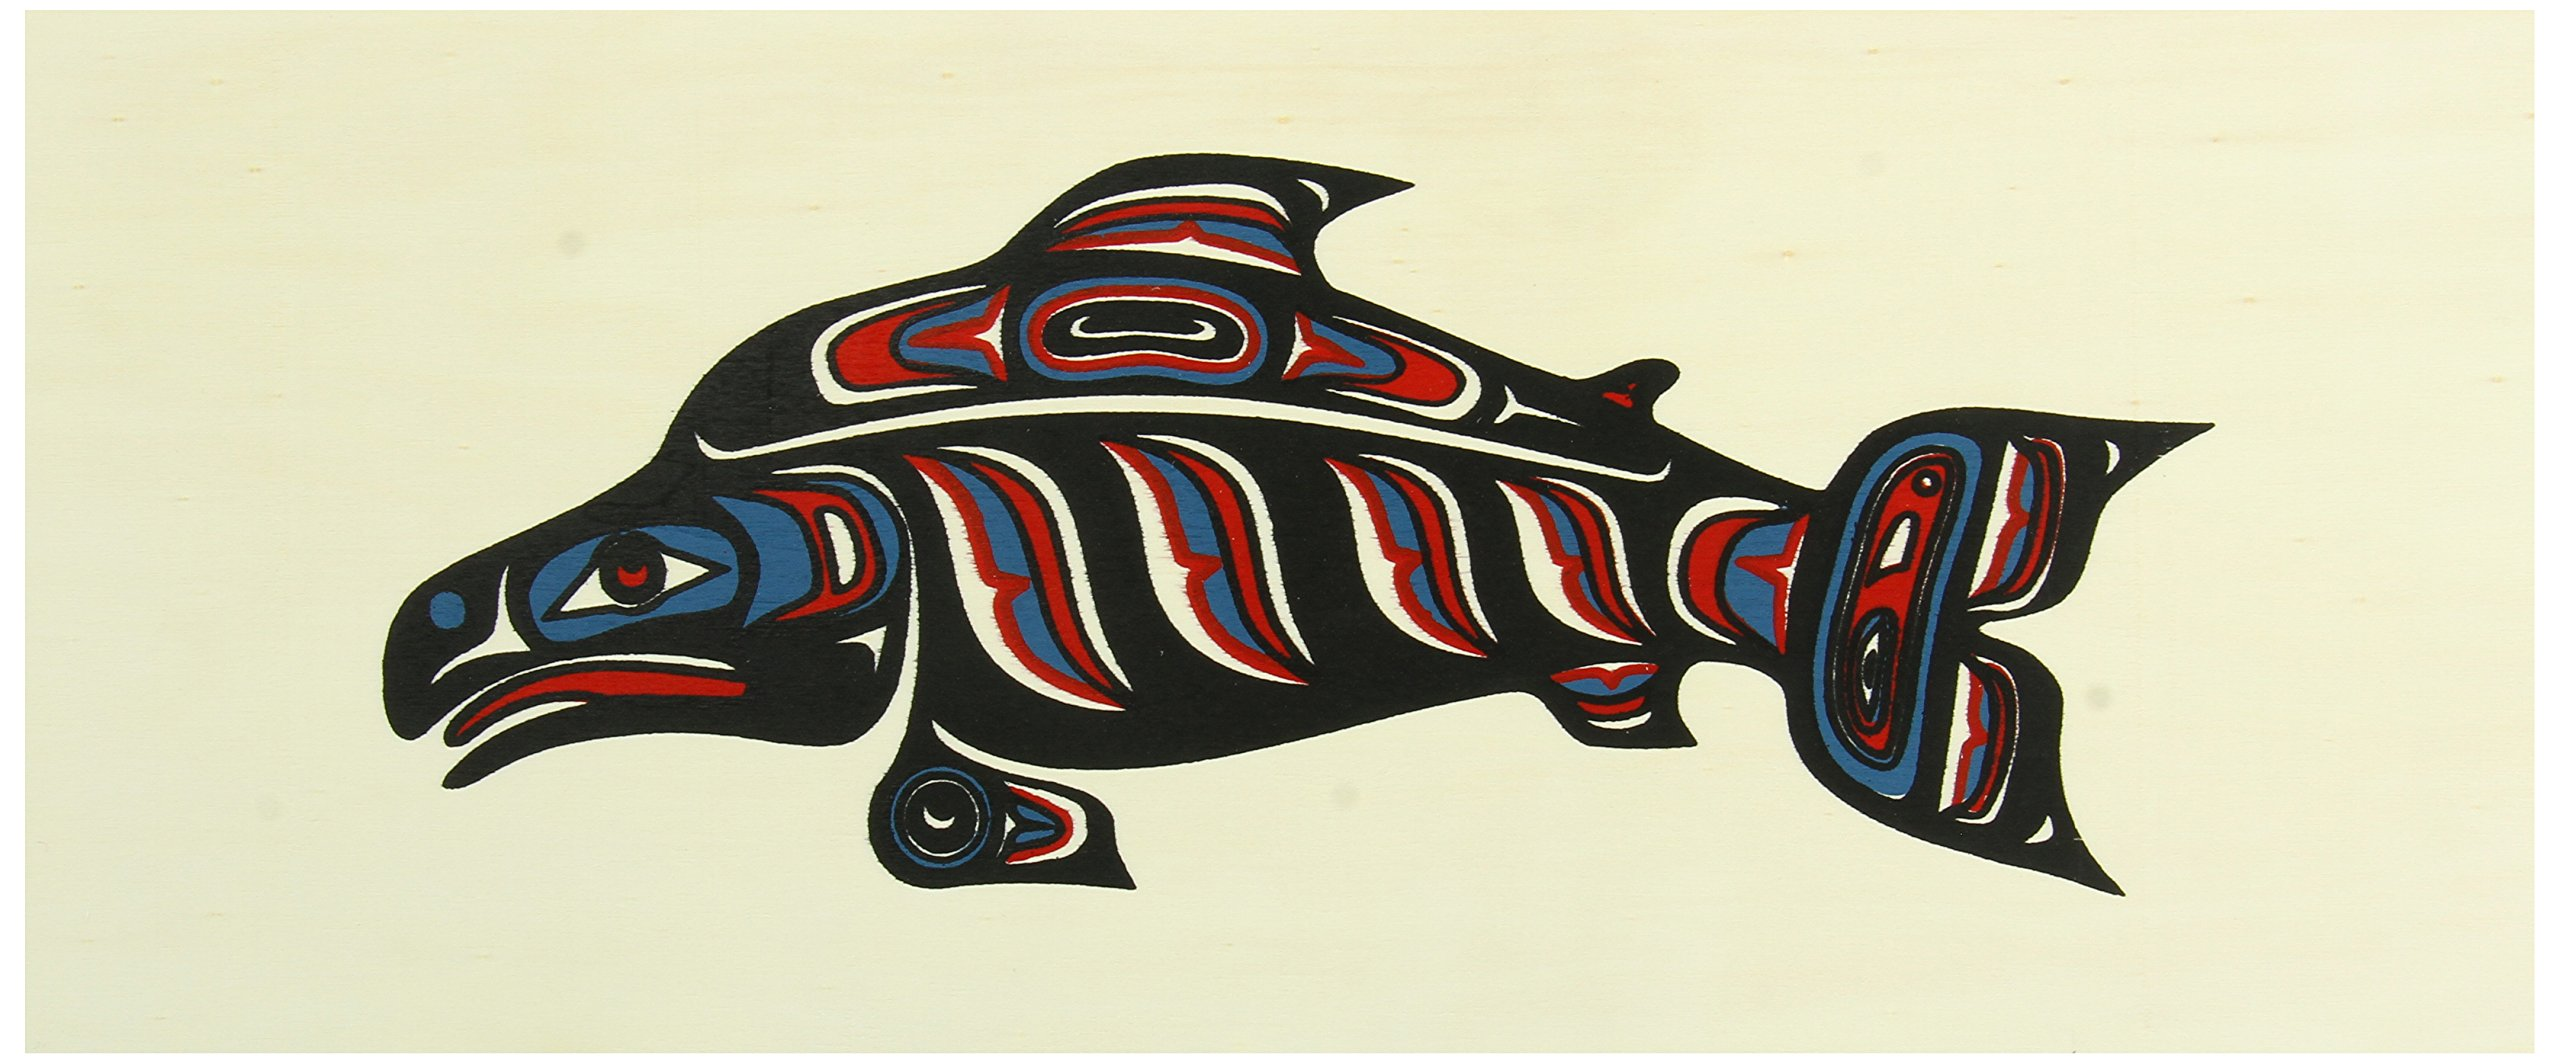 Alaska Smokehouse Smoked Salmon Fillet in Wood Gift Box 16 oz, Assorted Designs